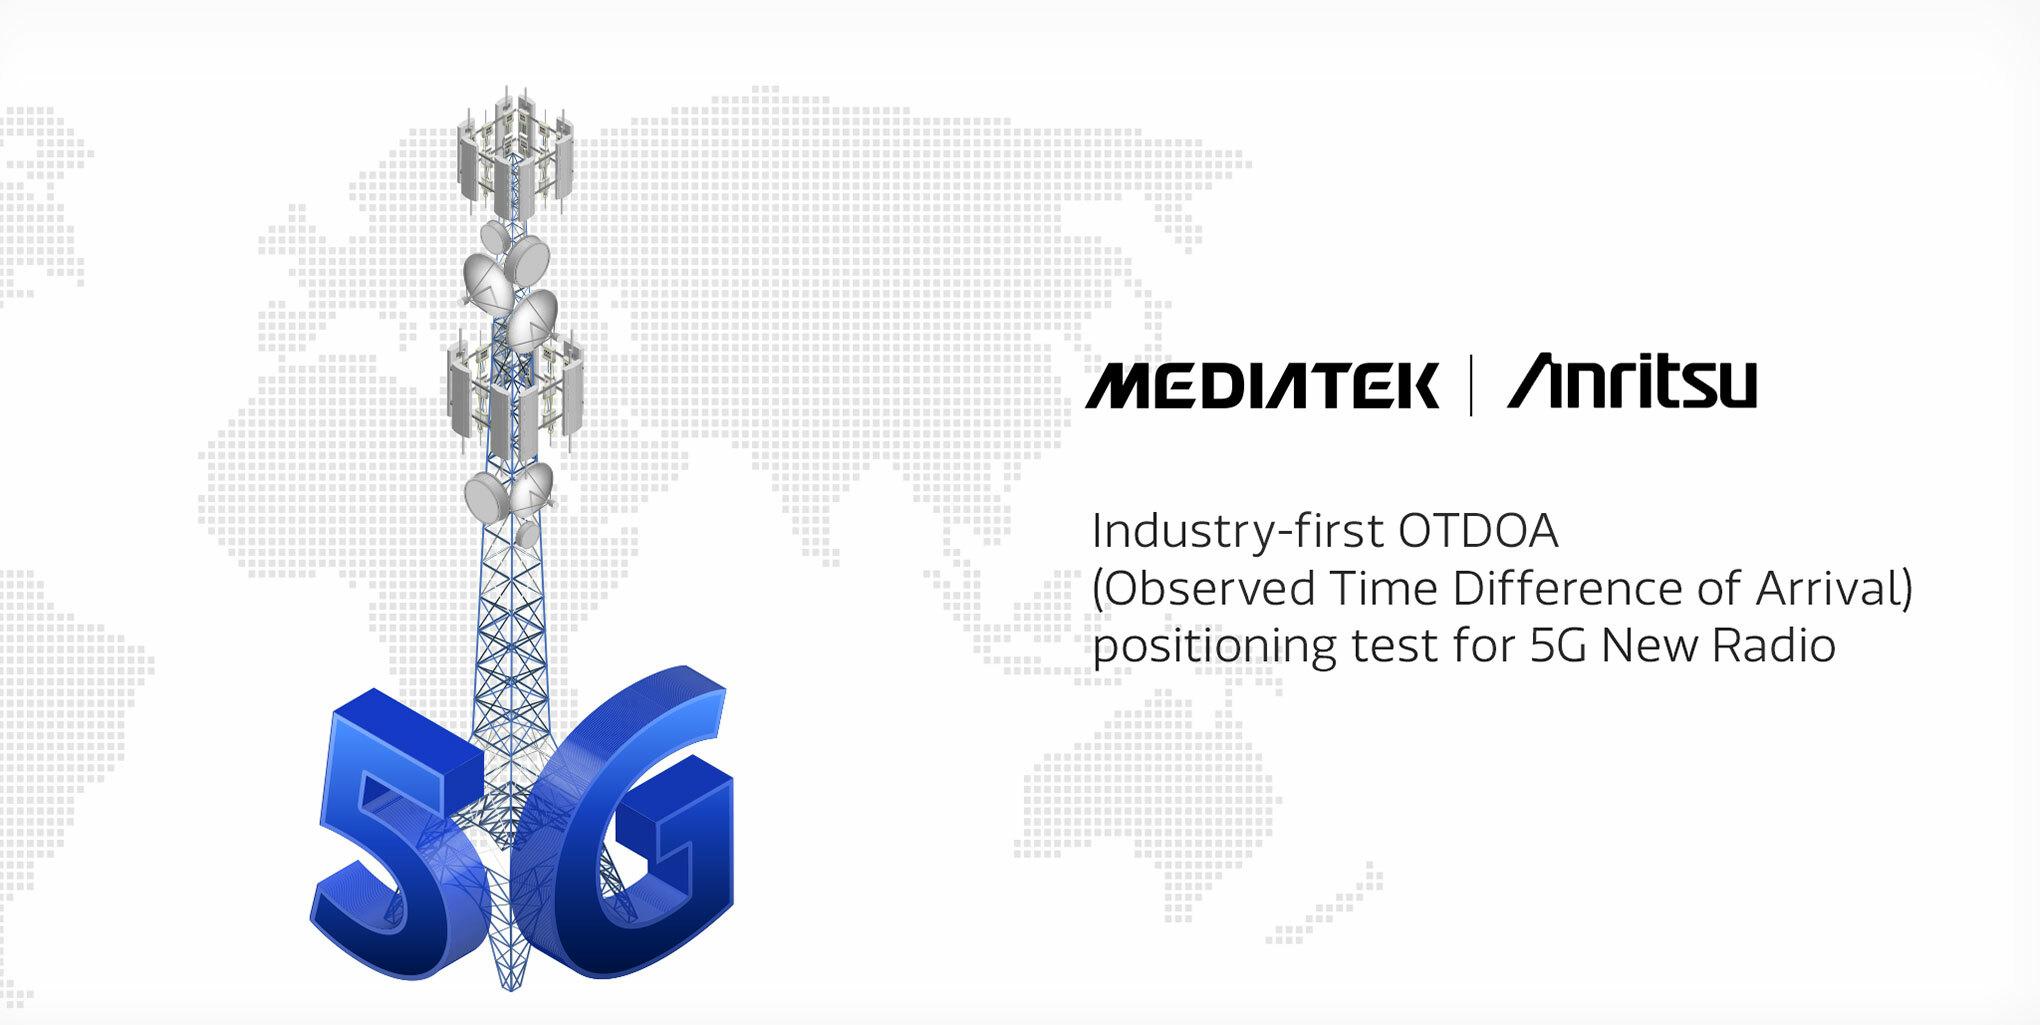 Industry-First OTDOA Positioning Test for 5G NR